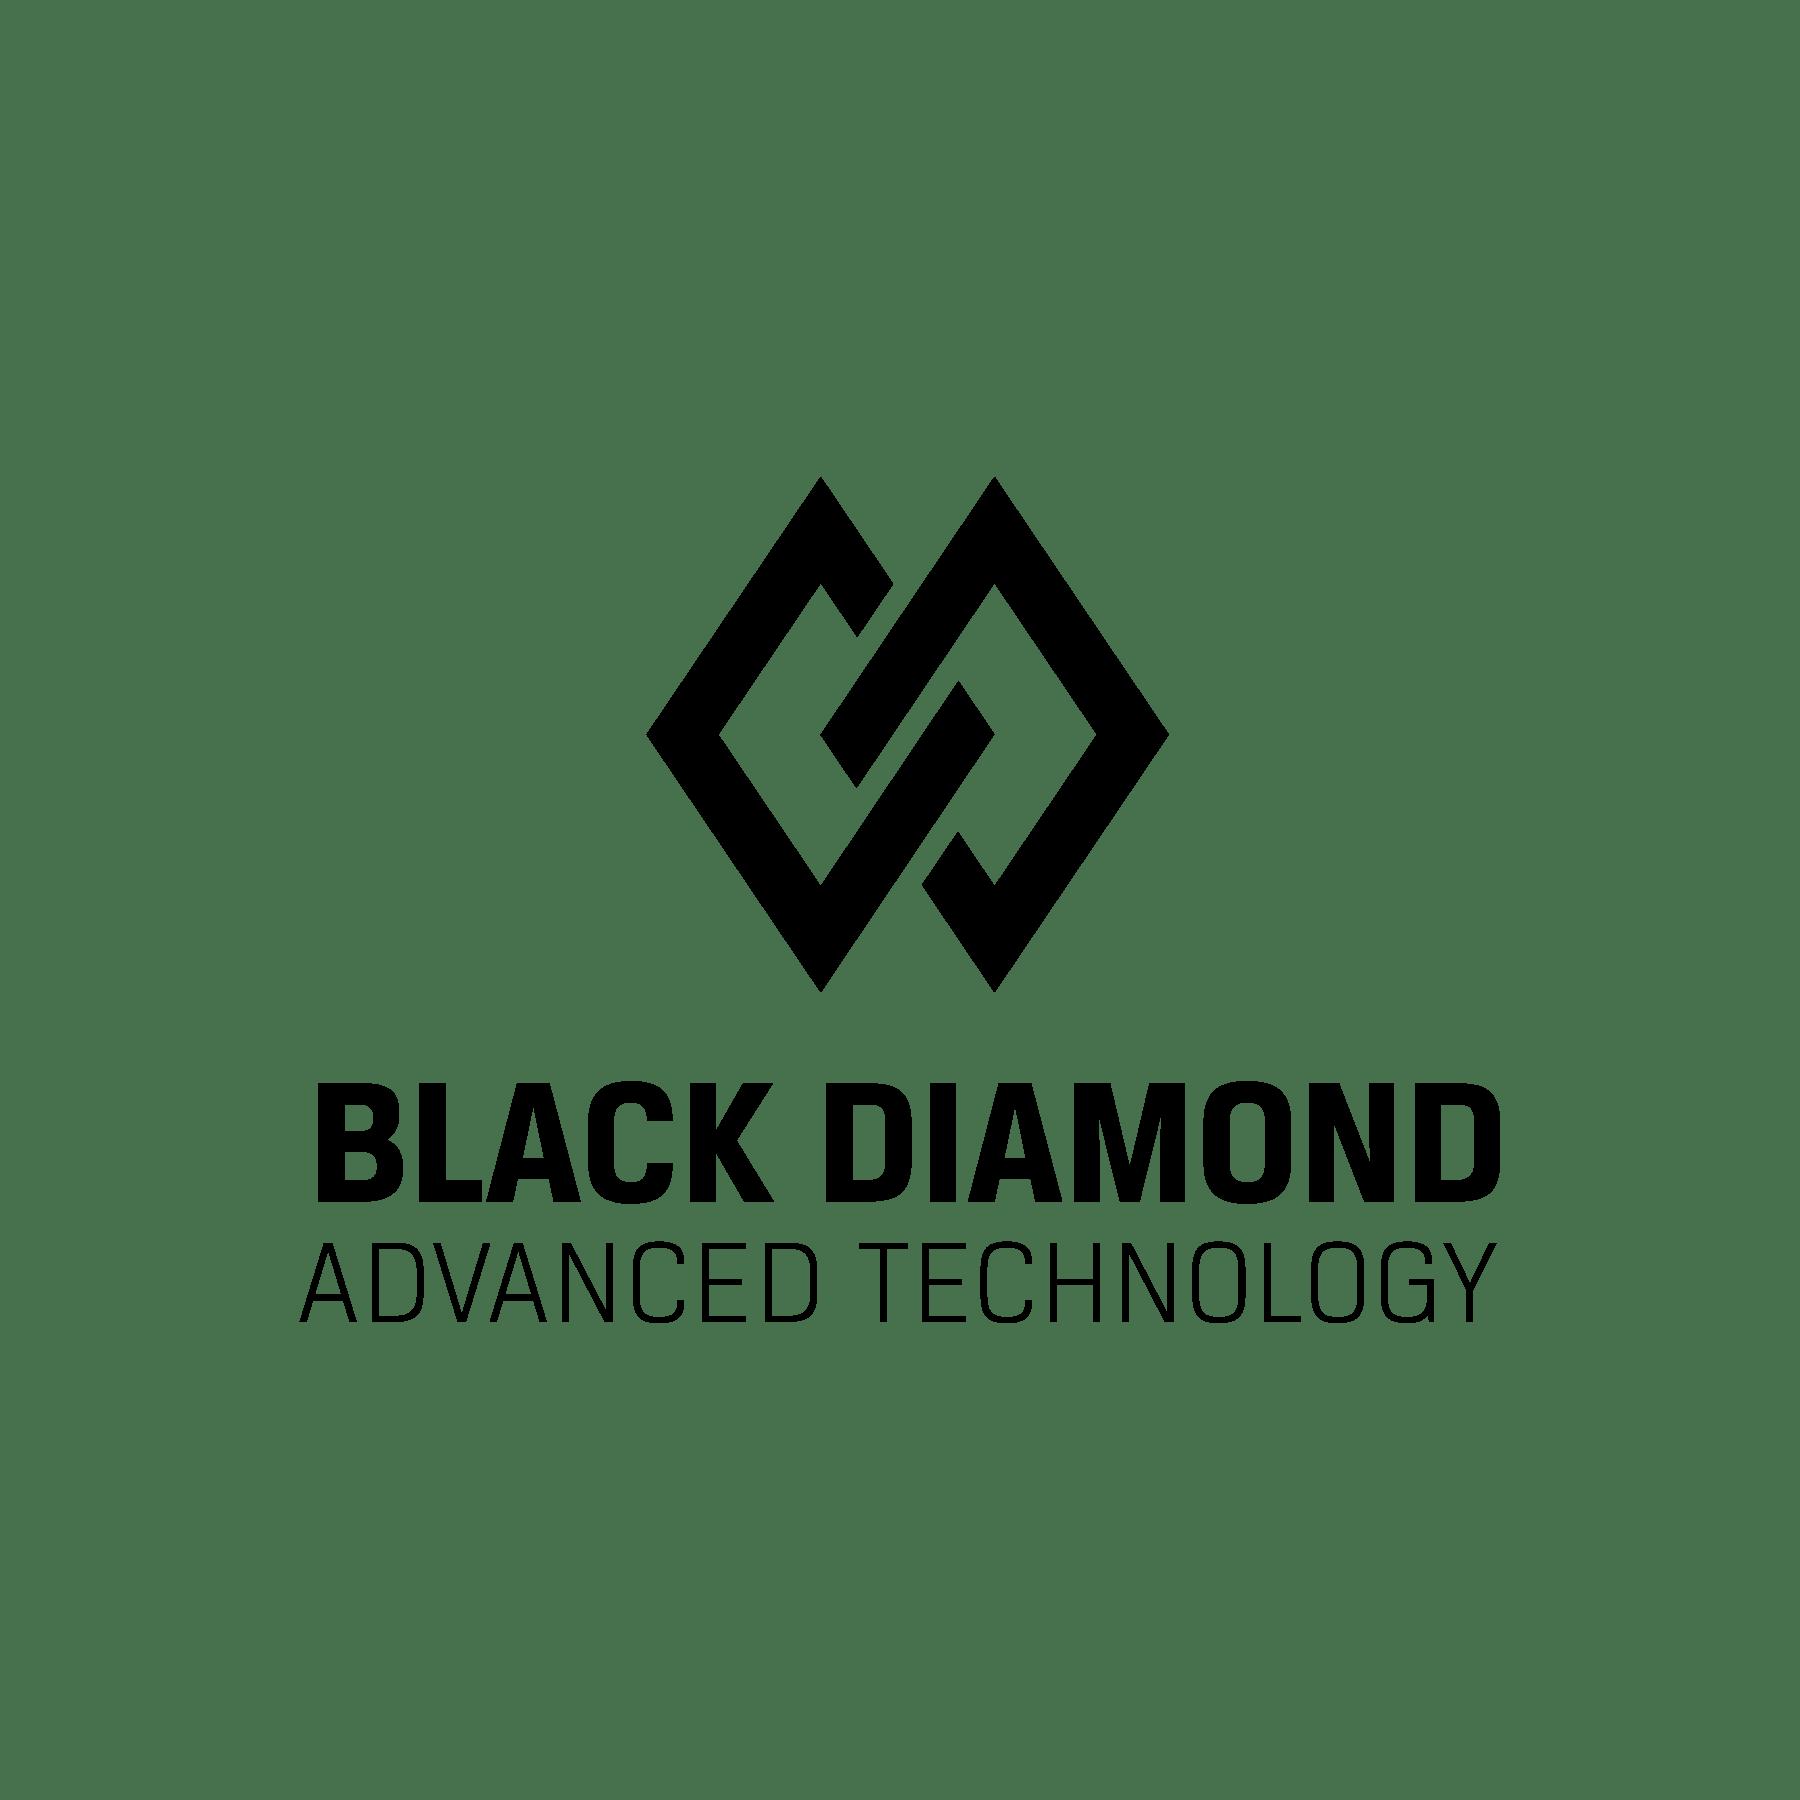 New Leadership At Black Diamond Advanced Technology